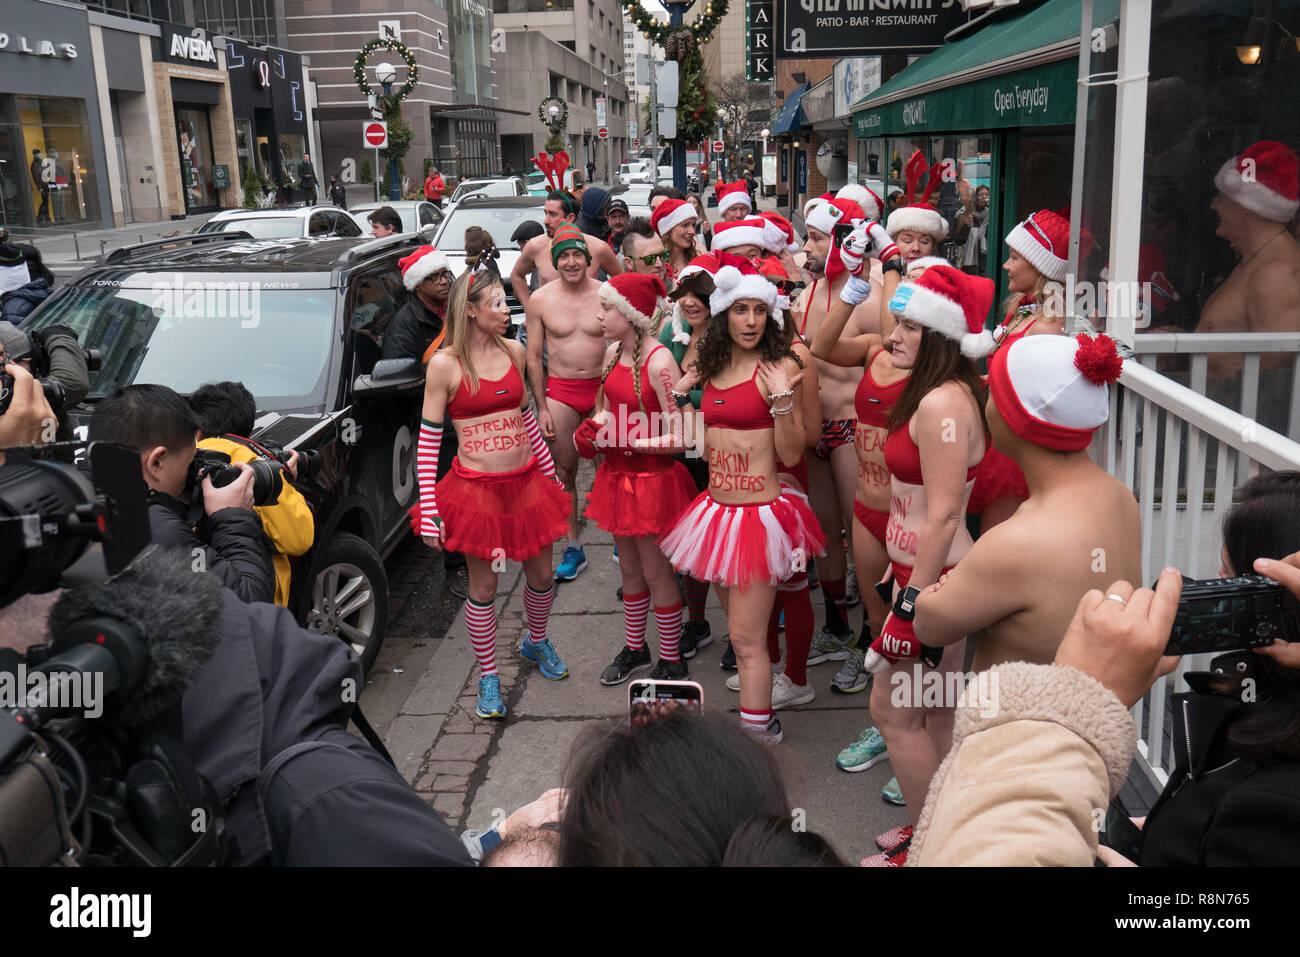 2b315fec11649 people getting ready to participate in the annual santa speedo run in  Toronto Canada to raise